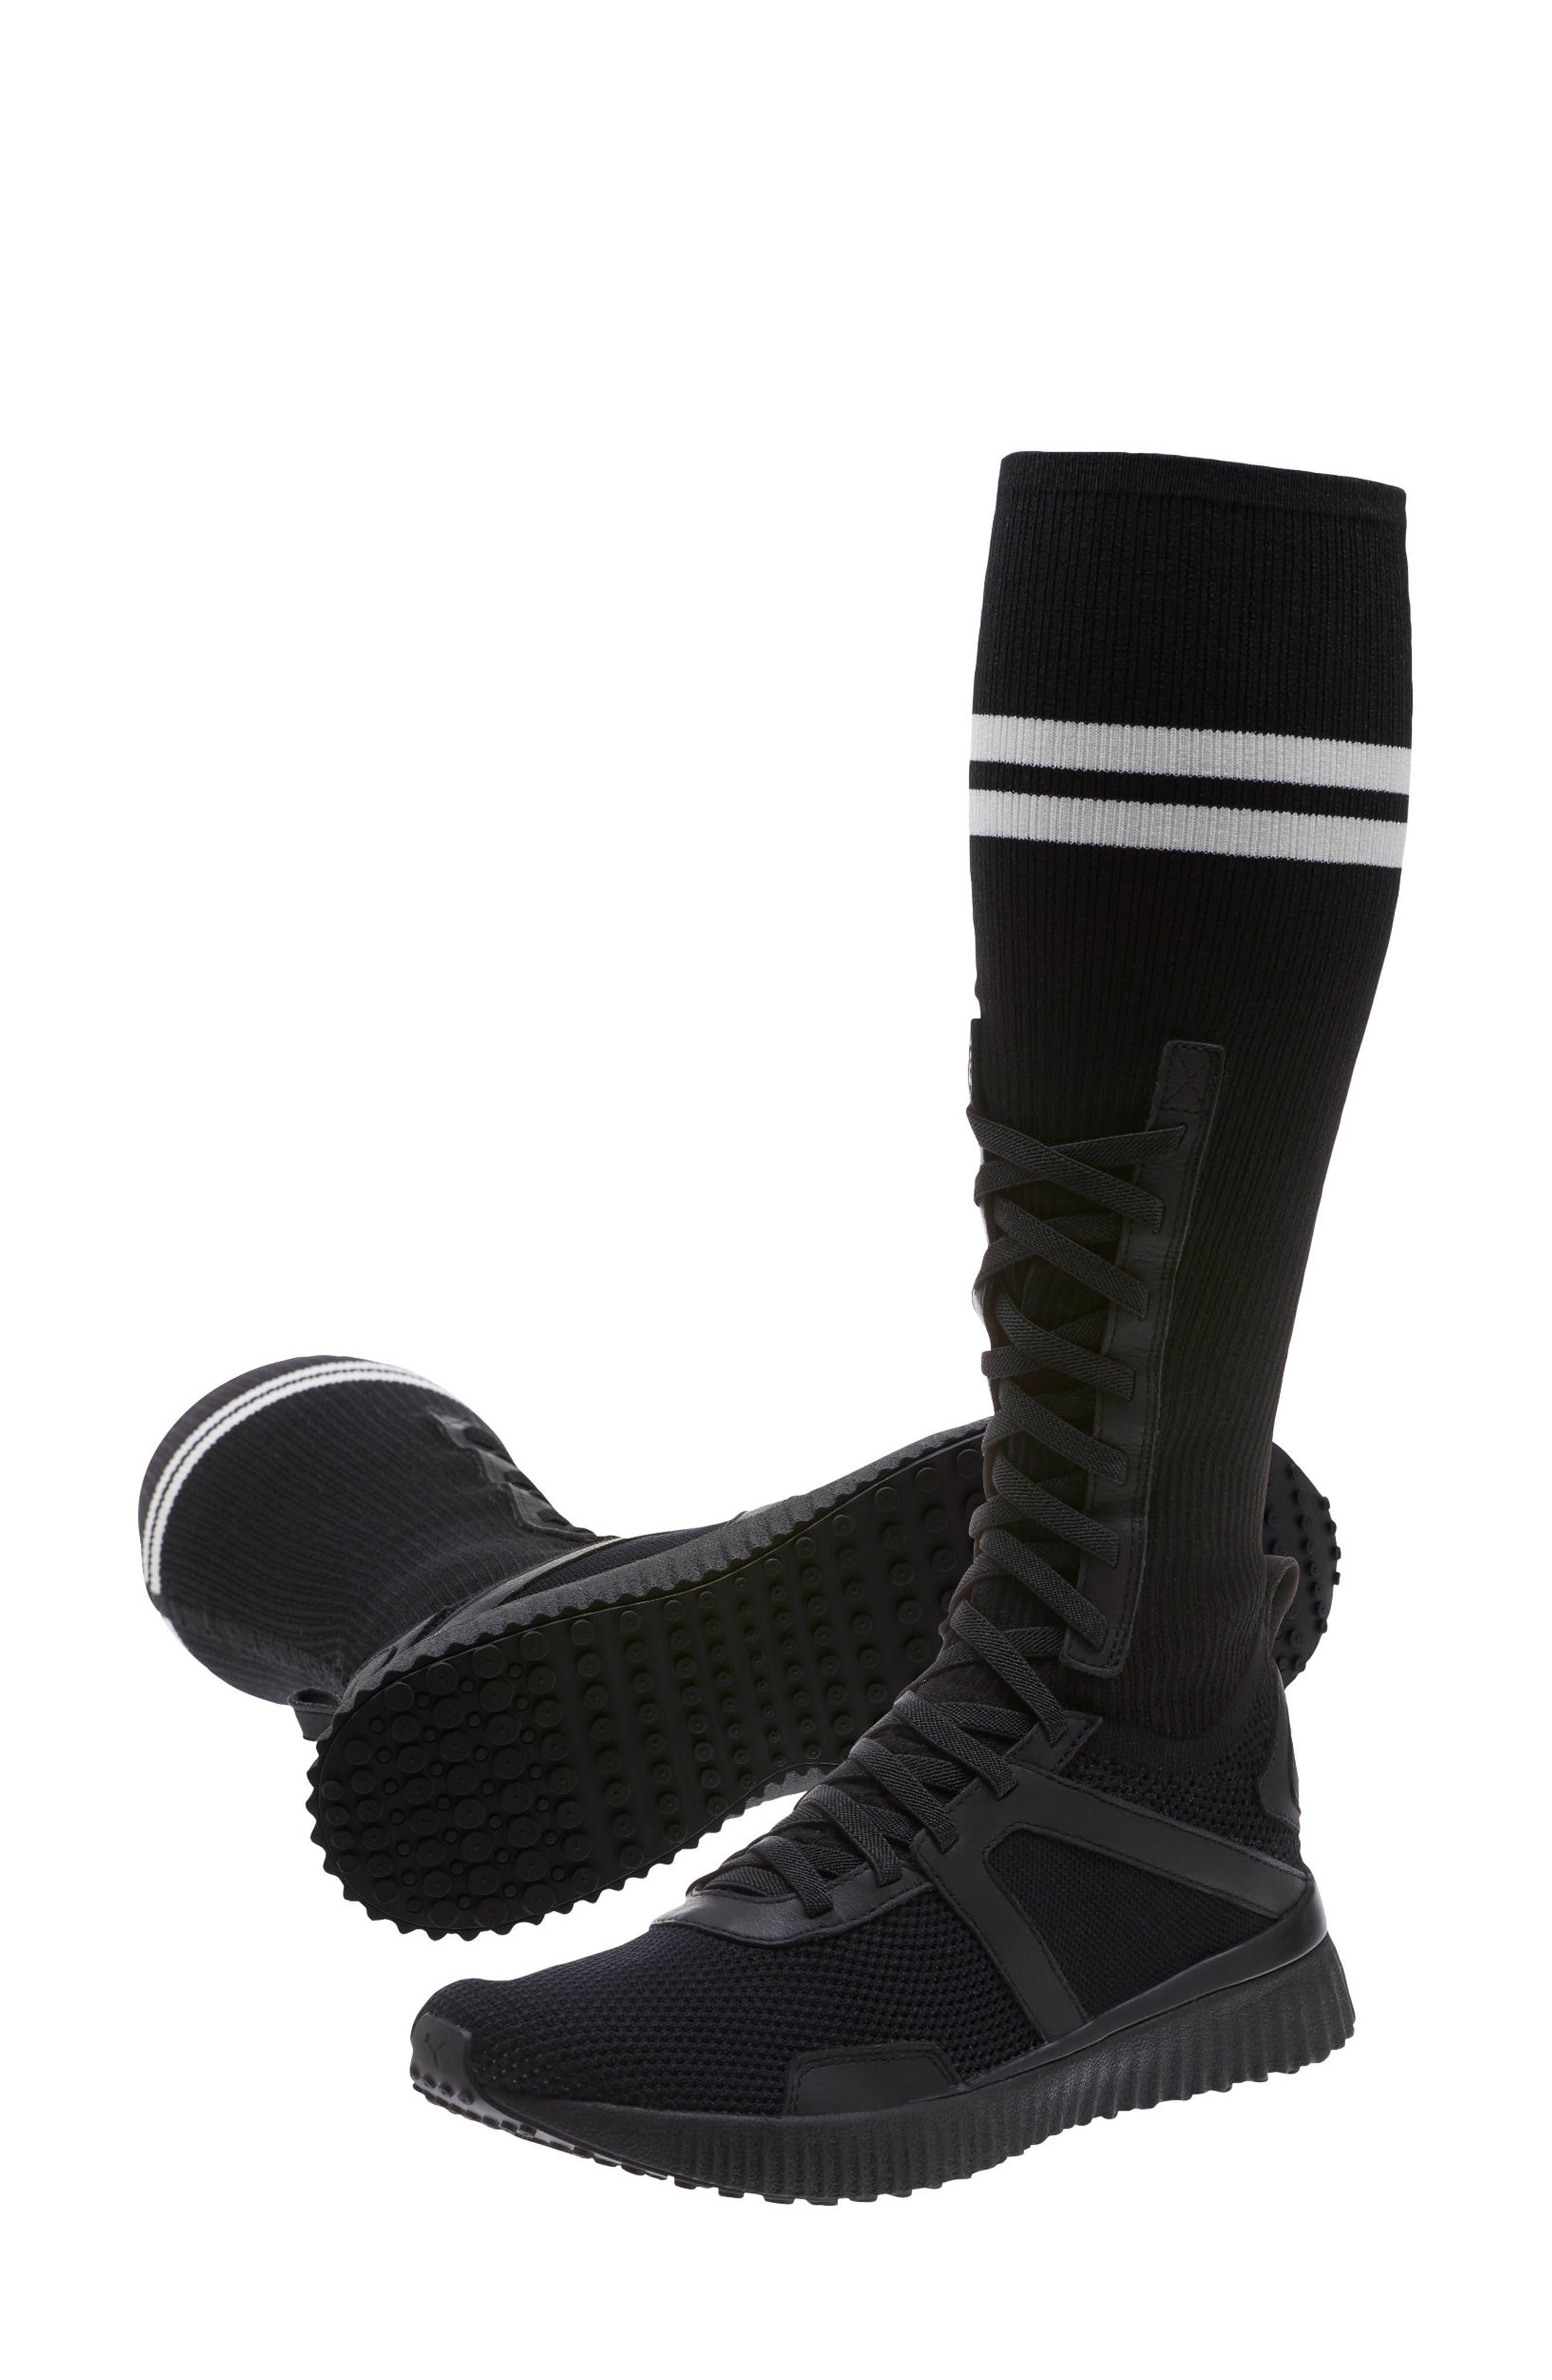 Main Image - FENTY PUMA by Rihanna Sneaker Boot (Women)